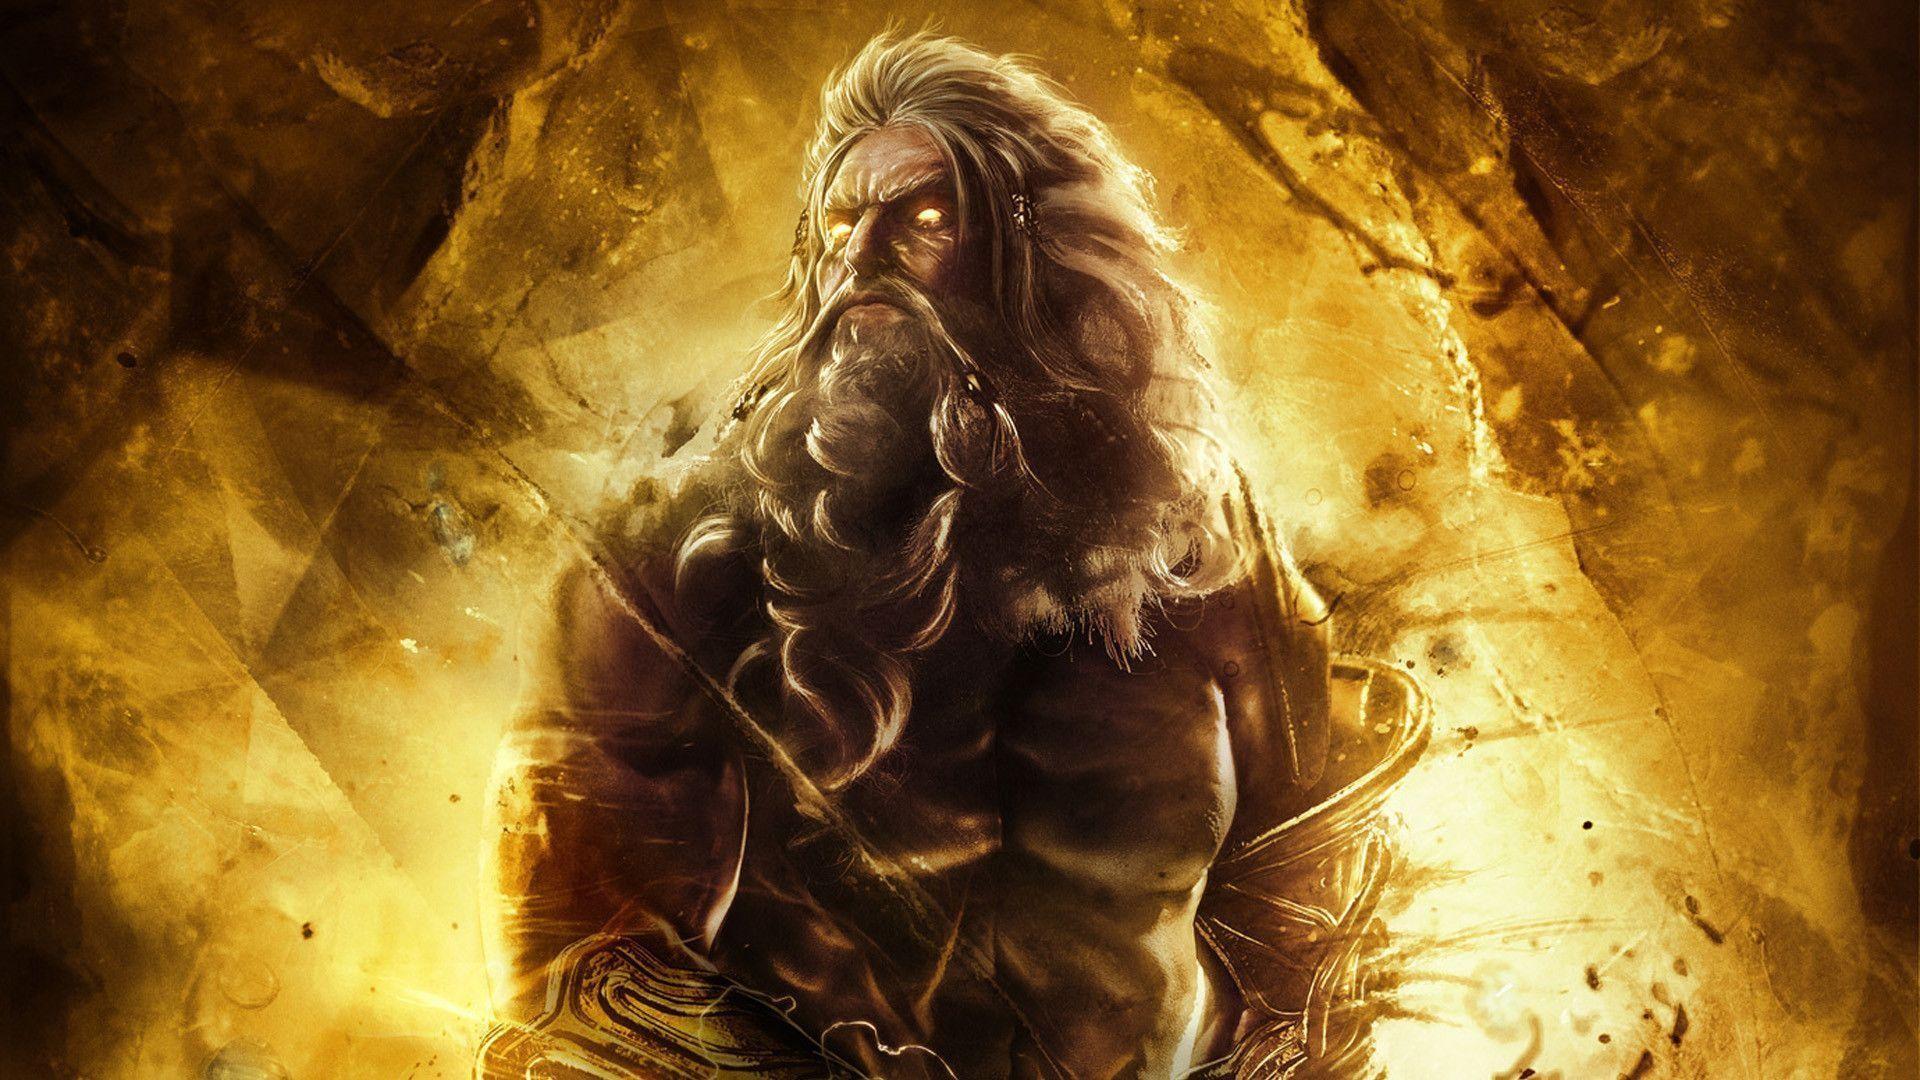 DeviantArt: More Like God of War: Ascension Zeus Wallpaper by xKirbz